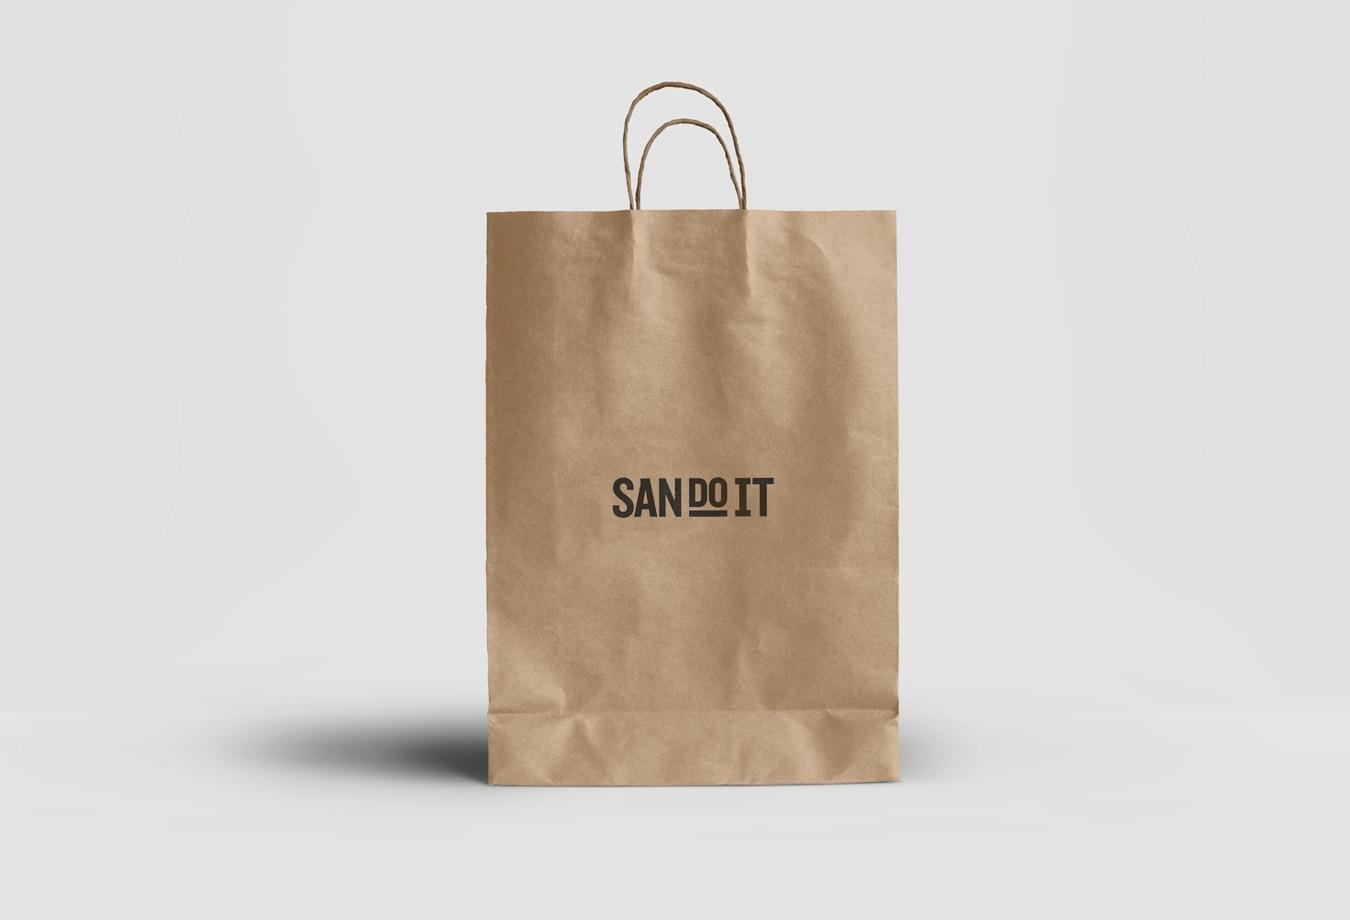 09-sandoit-visualidentity